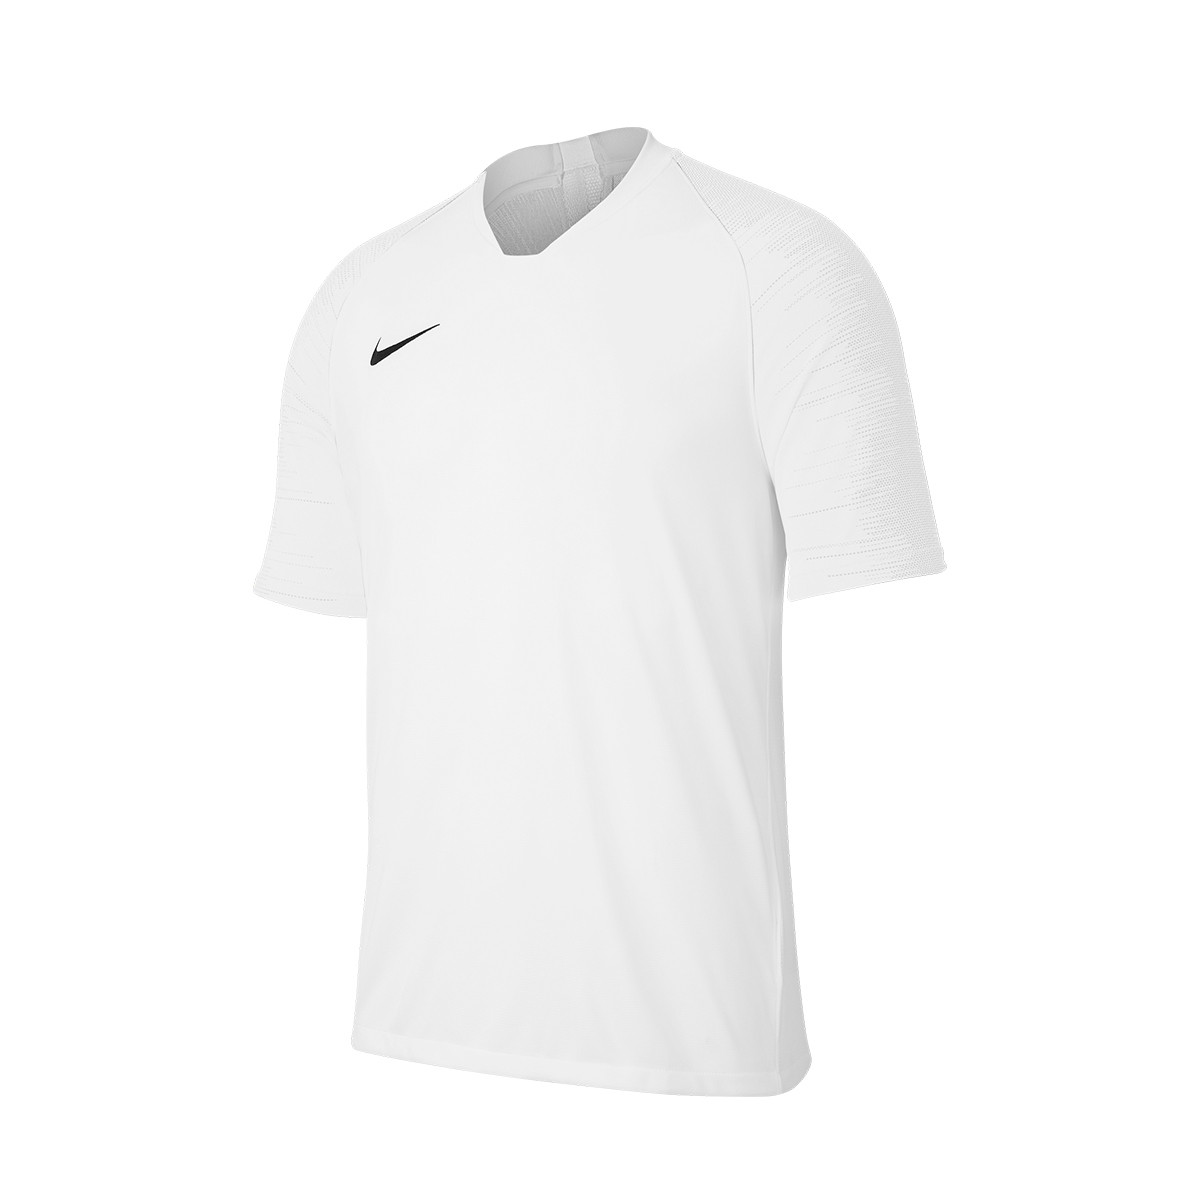 Ocurrir apagado Constitución  Jersey Nike Strike m/c White-White-Black - Football store Fútbol Emotion